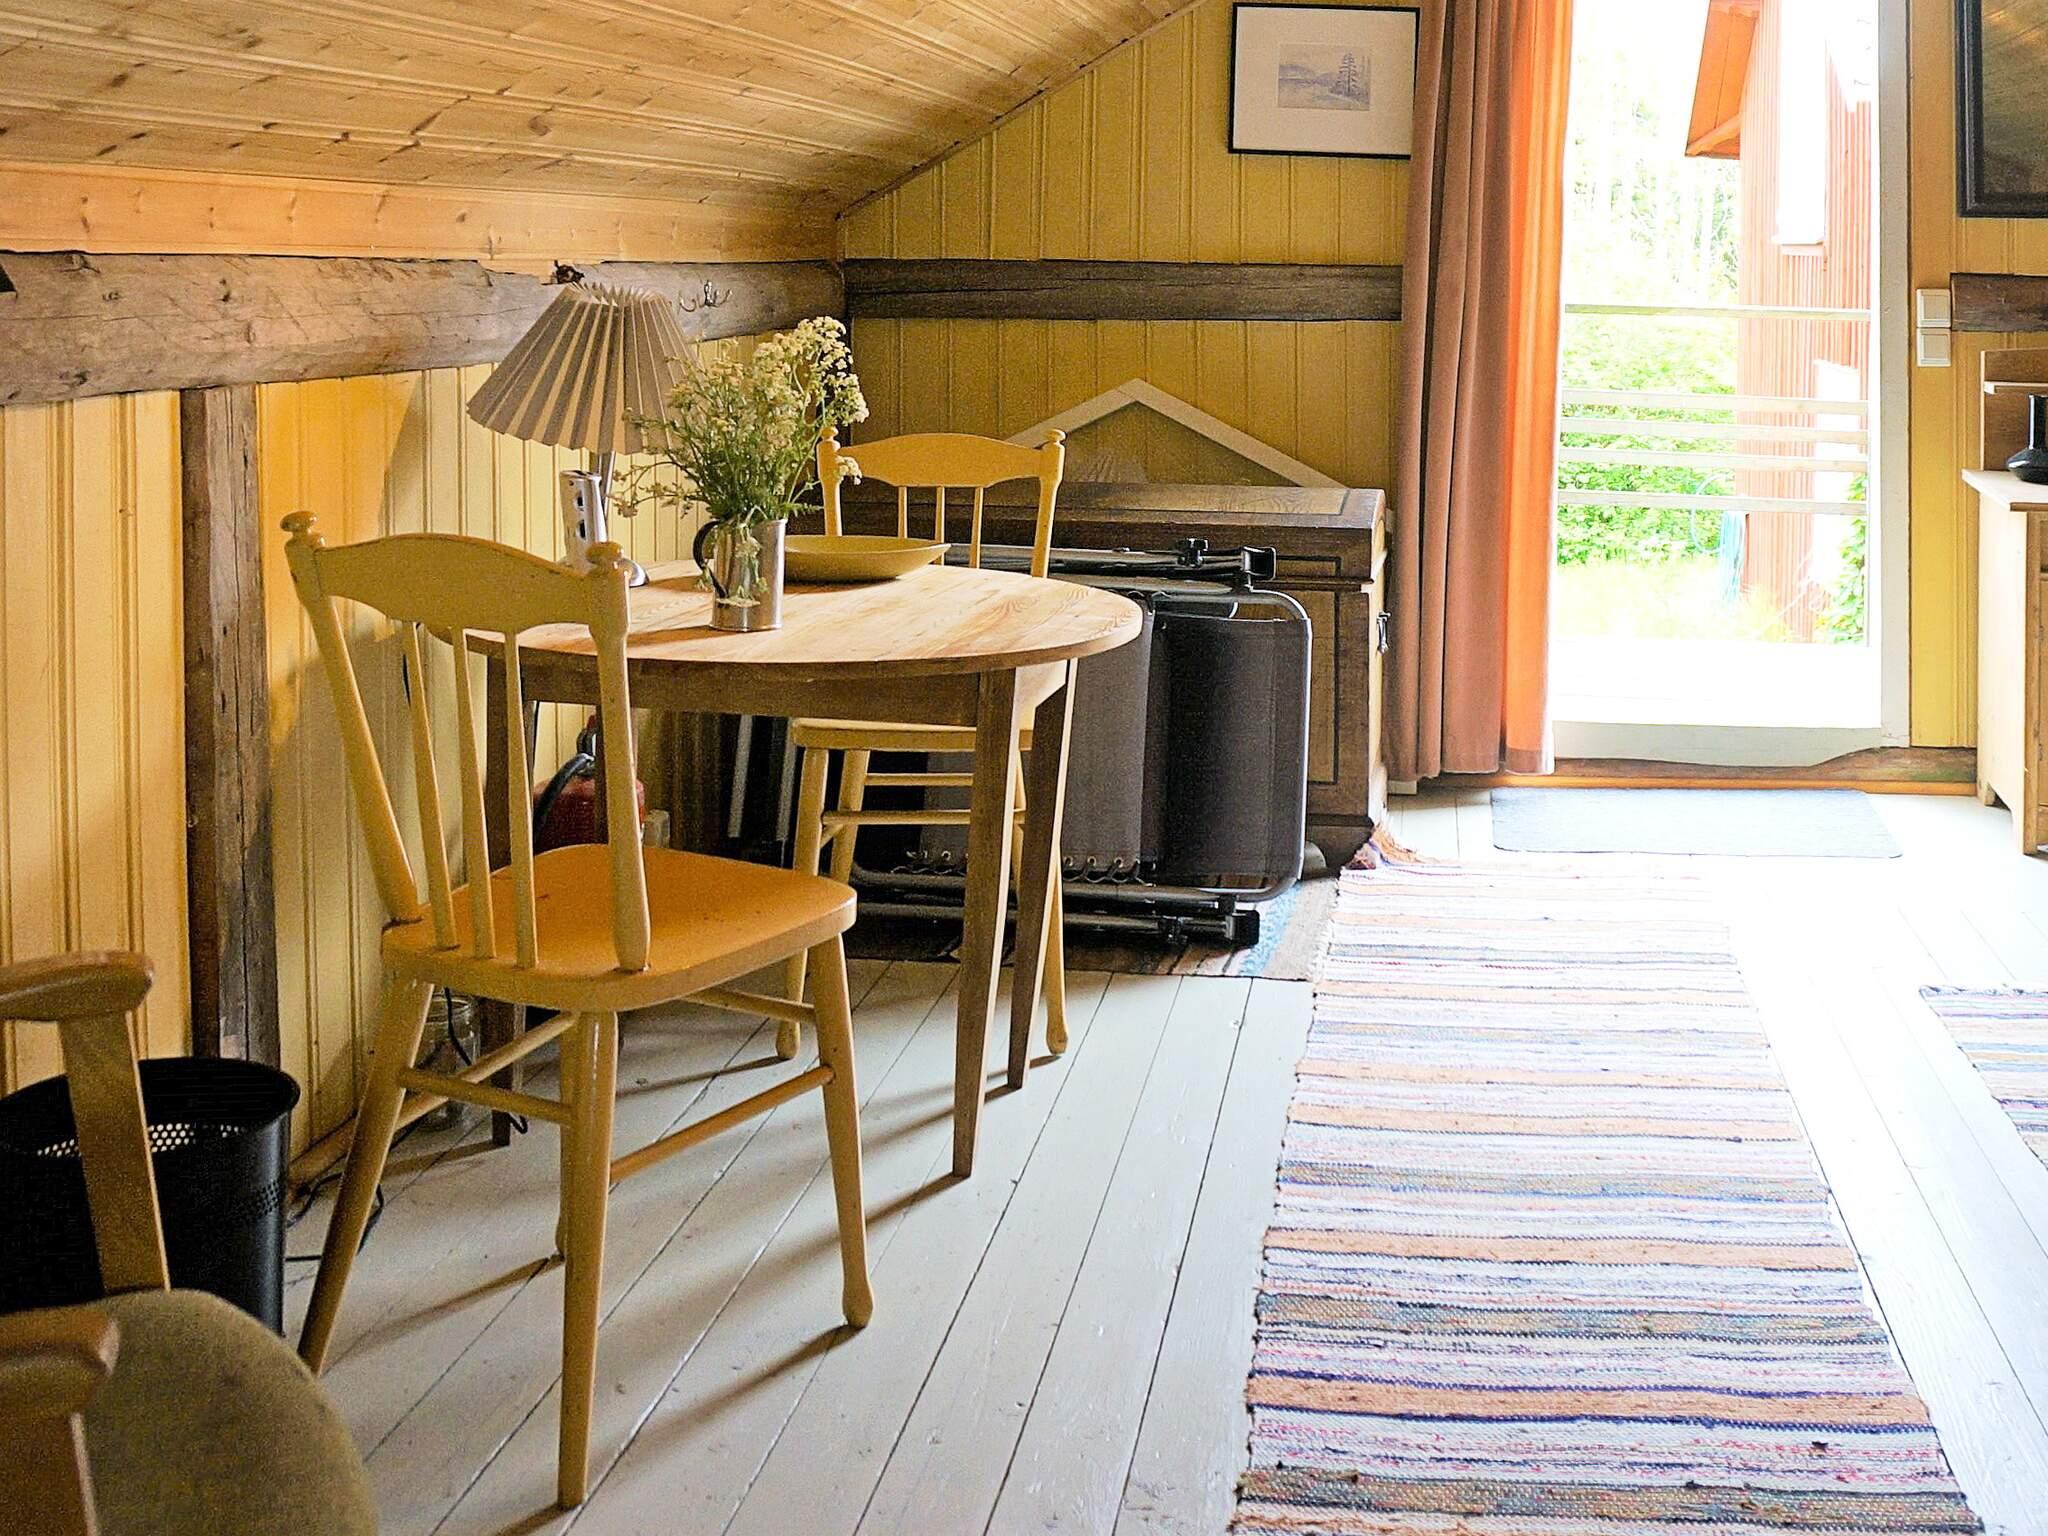 Ferienhaus Falköping (2636837), Trädet, Västra Götaland län, Westschweden, Schweden, Bild 18